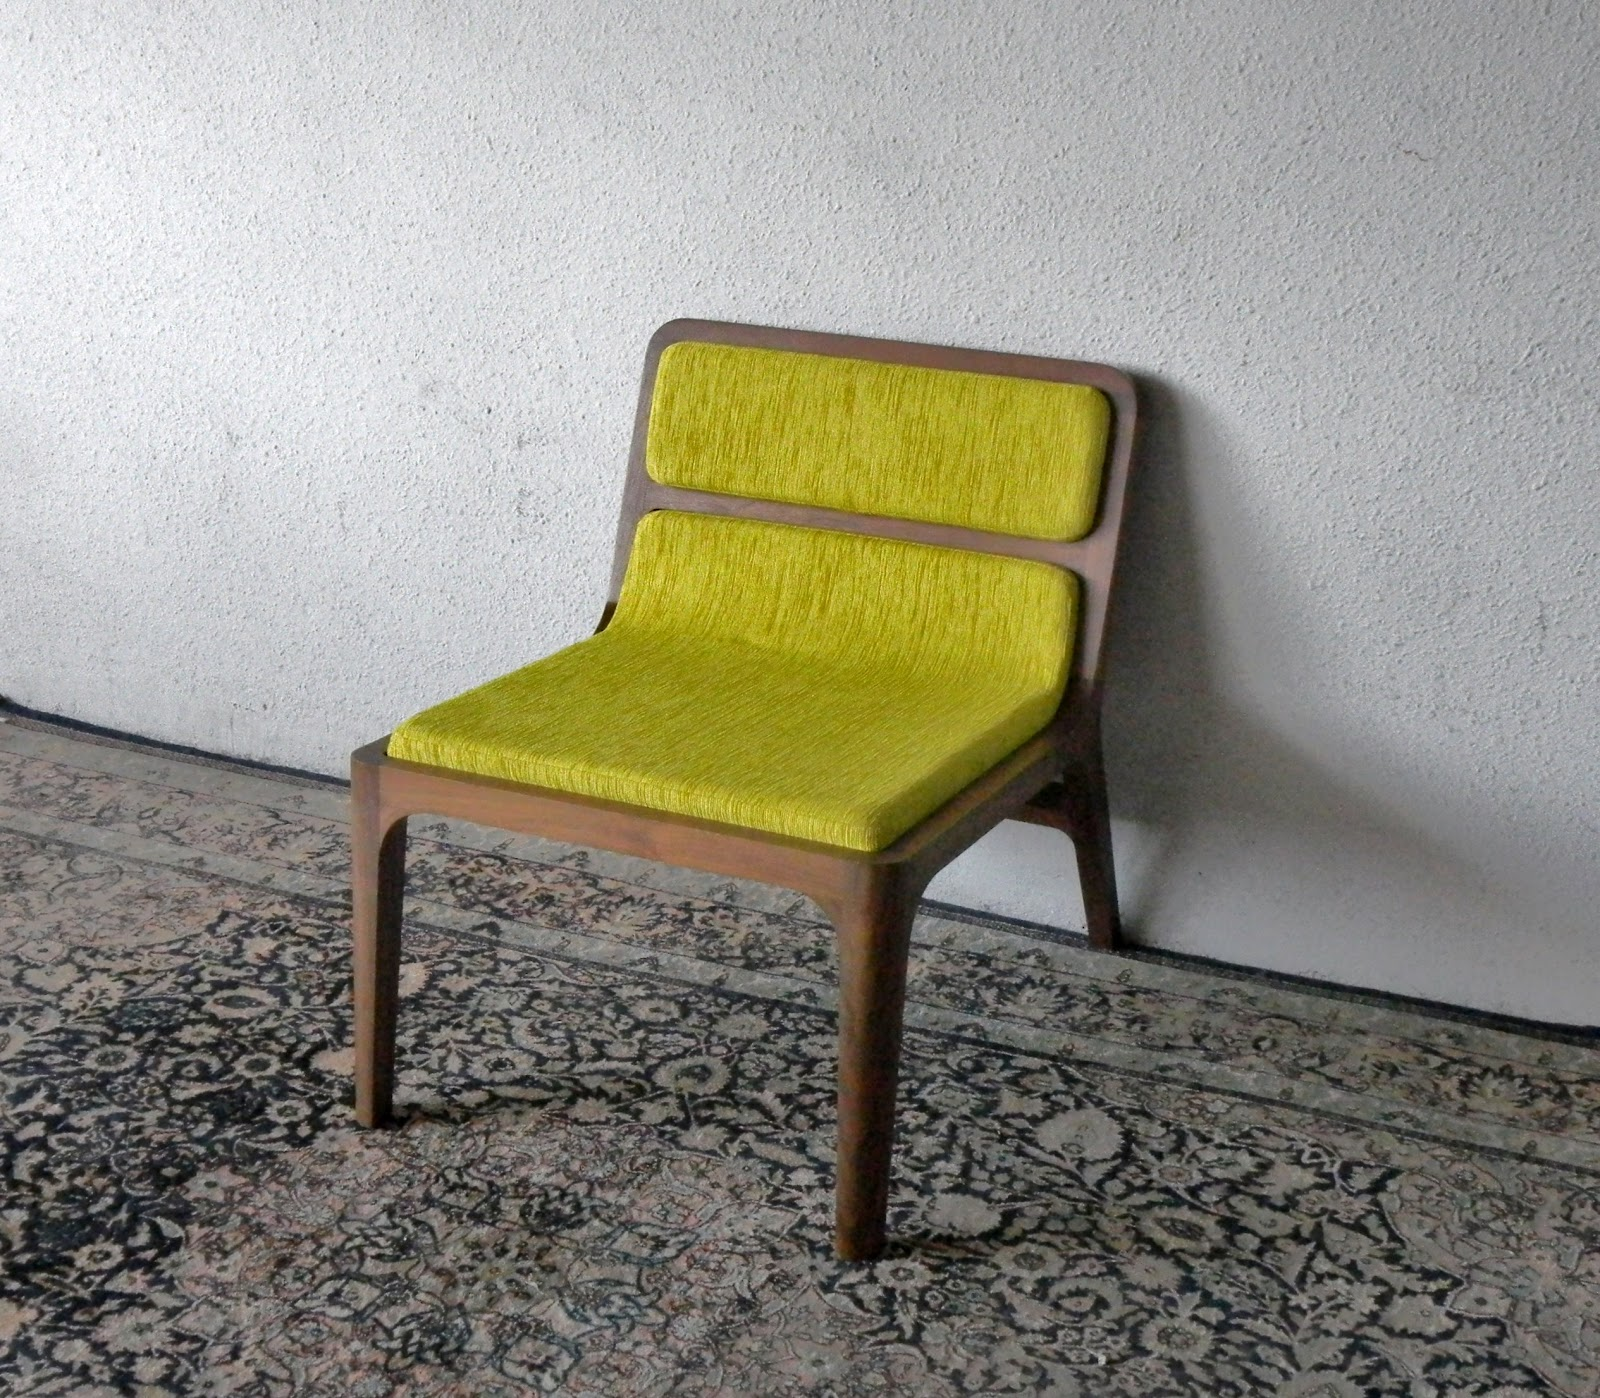 Swivel Chair Mustard Yellow Blazing Needles Papasan Lounge Cushion Second Charm Midcentury Modern Sofas And Armchairs